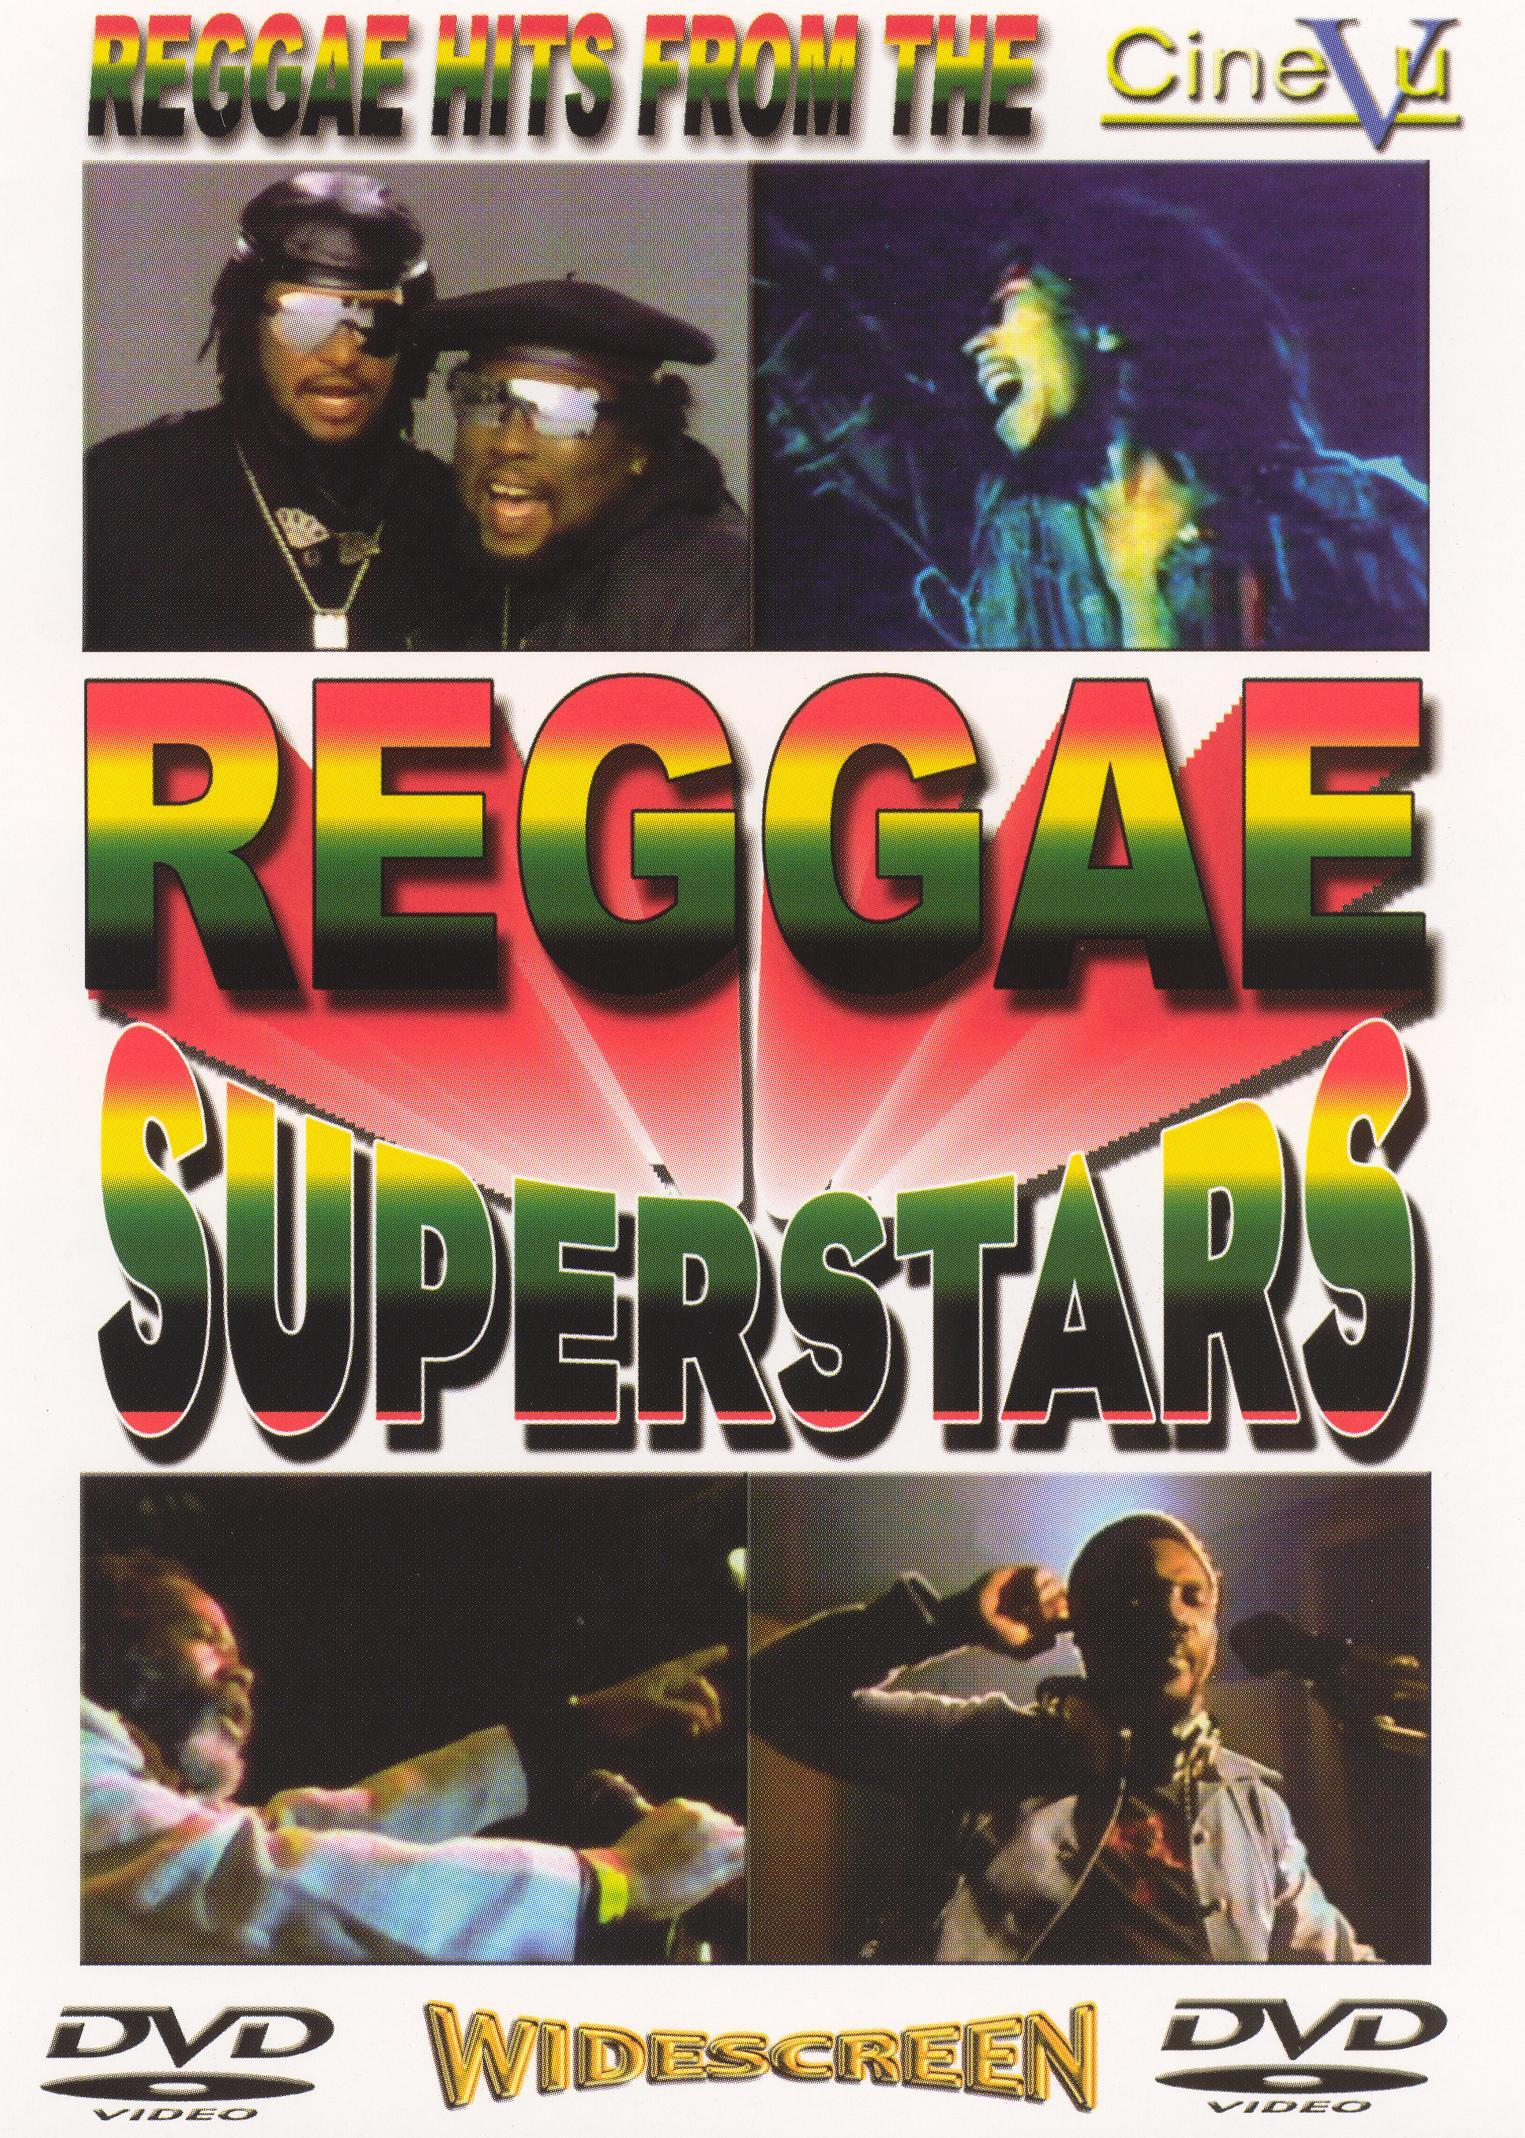 Reggae Superstars in Concert